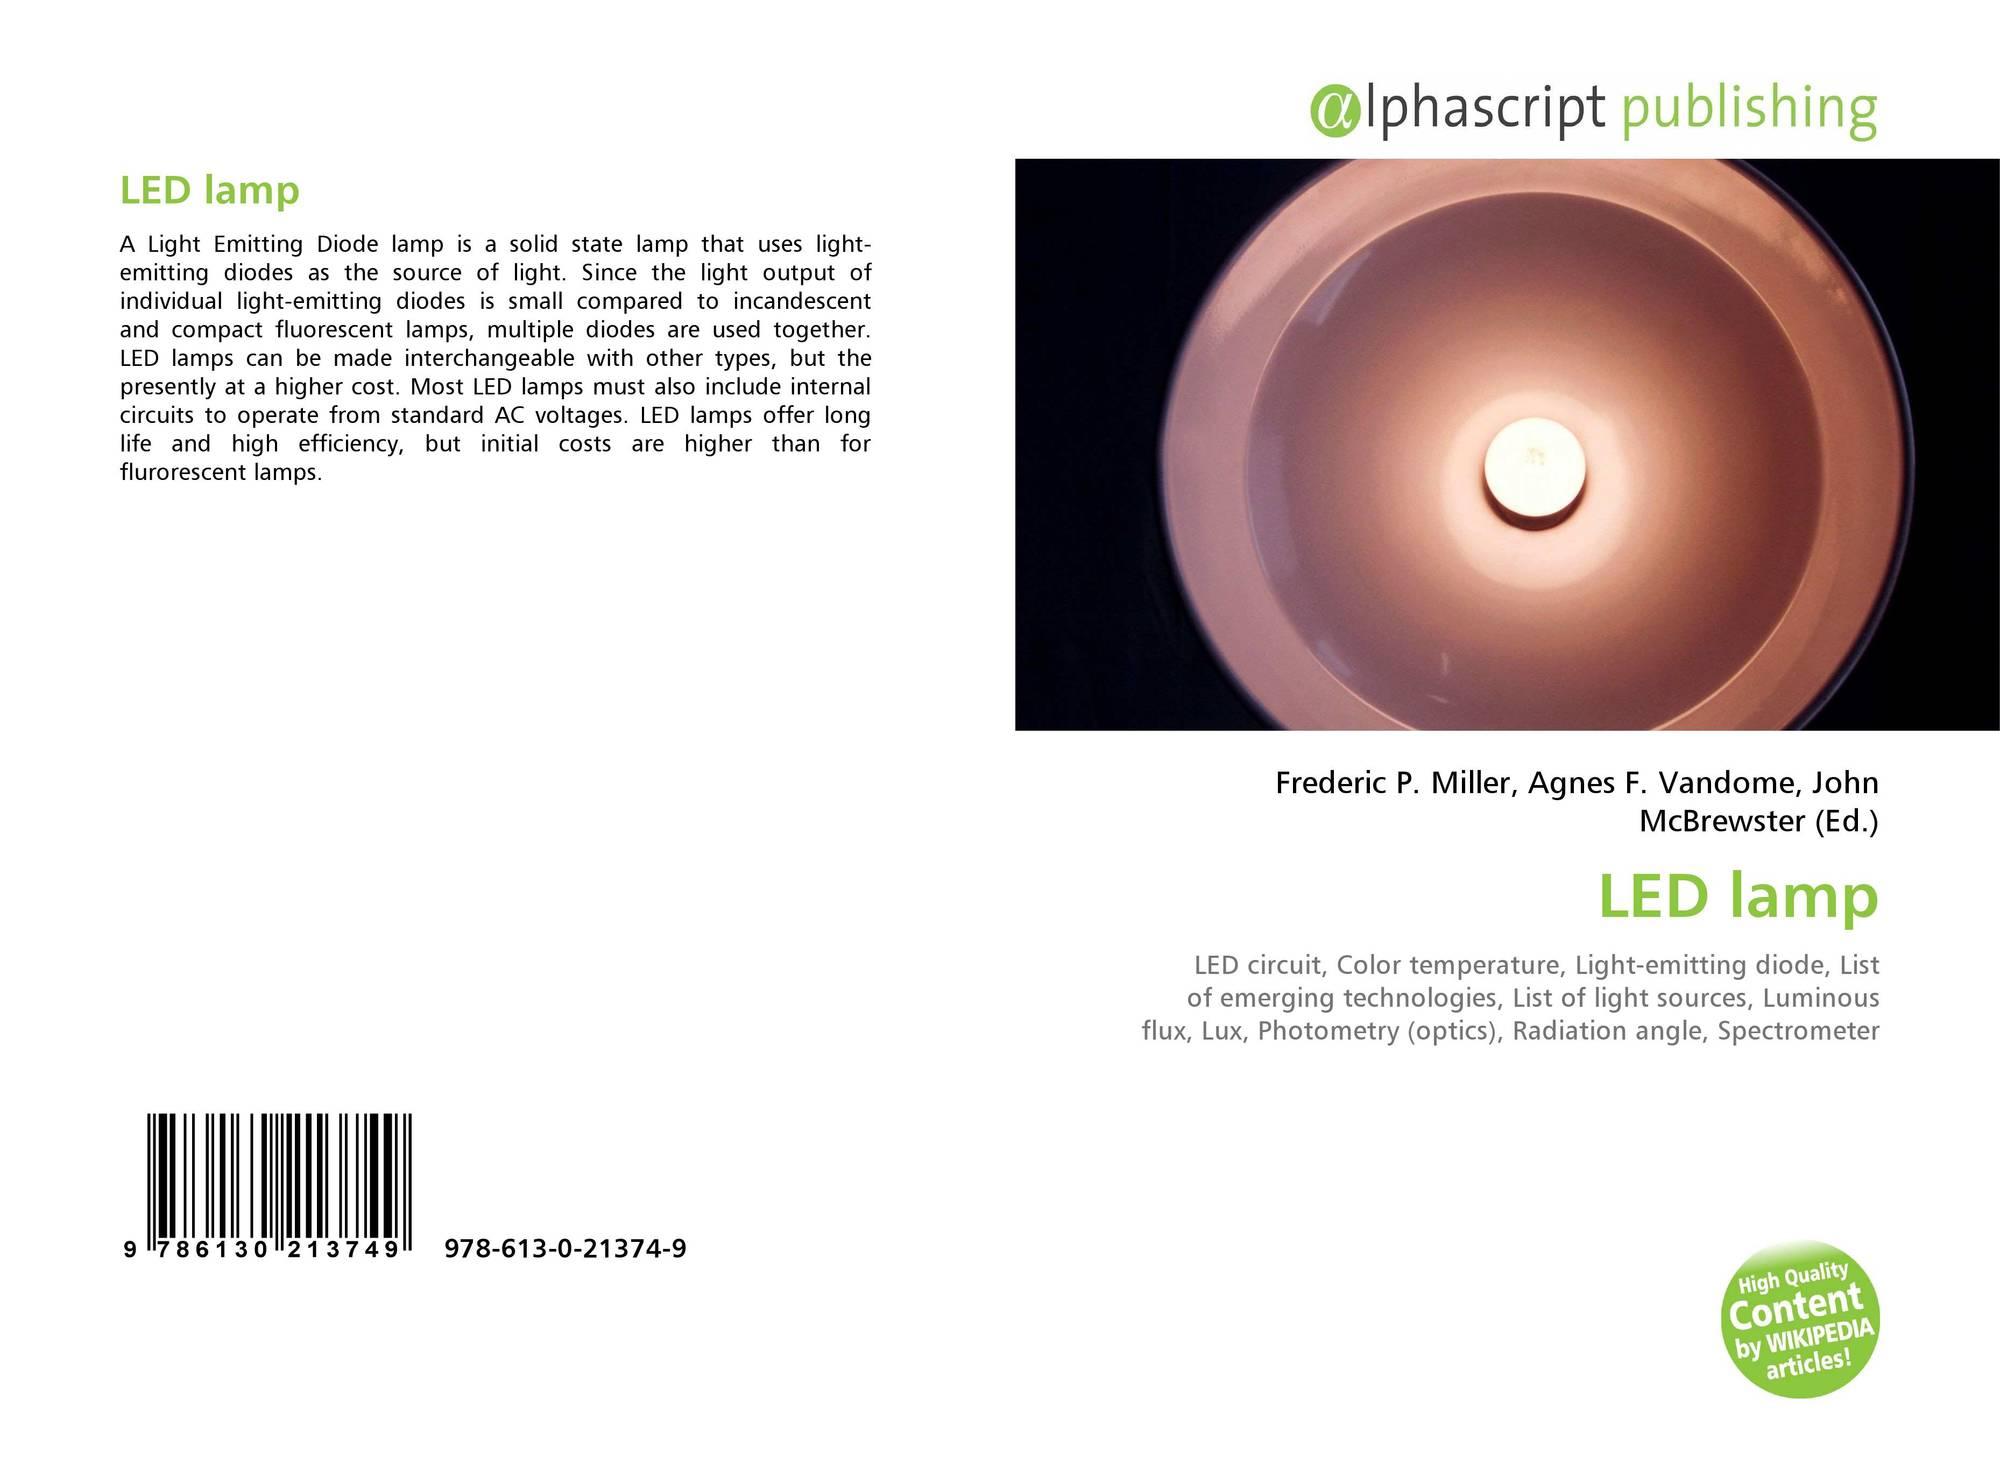 Led Lamp 978 613 0 21374 9 6130213743 9786130213749 Lightemitting Diodes Ledandlightcircuit Circuit Diagram Bookcover Of